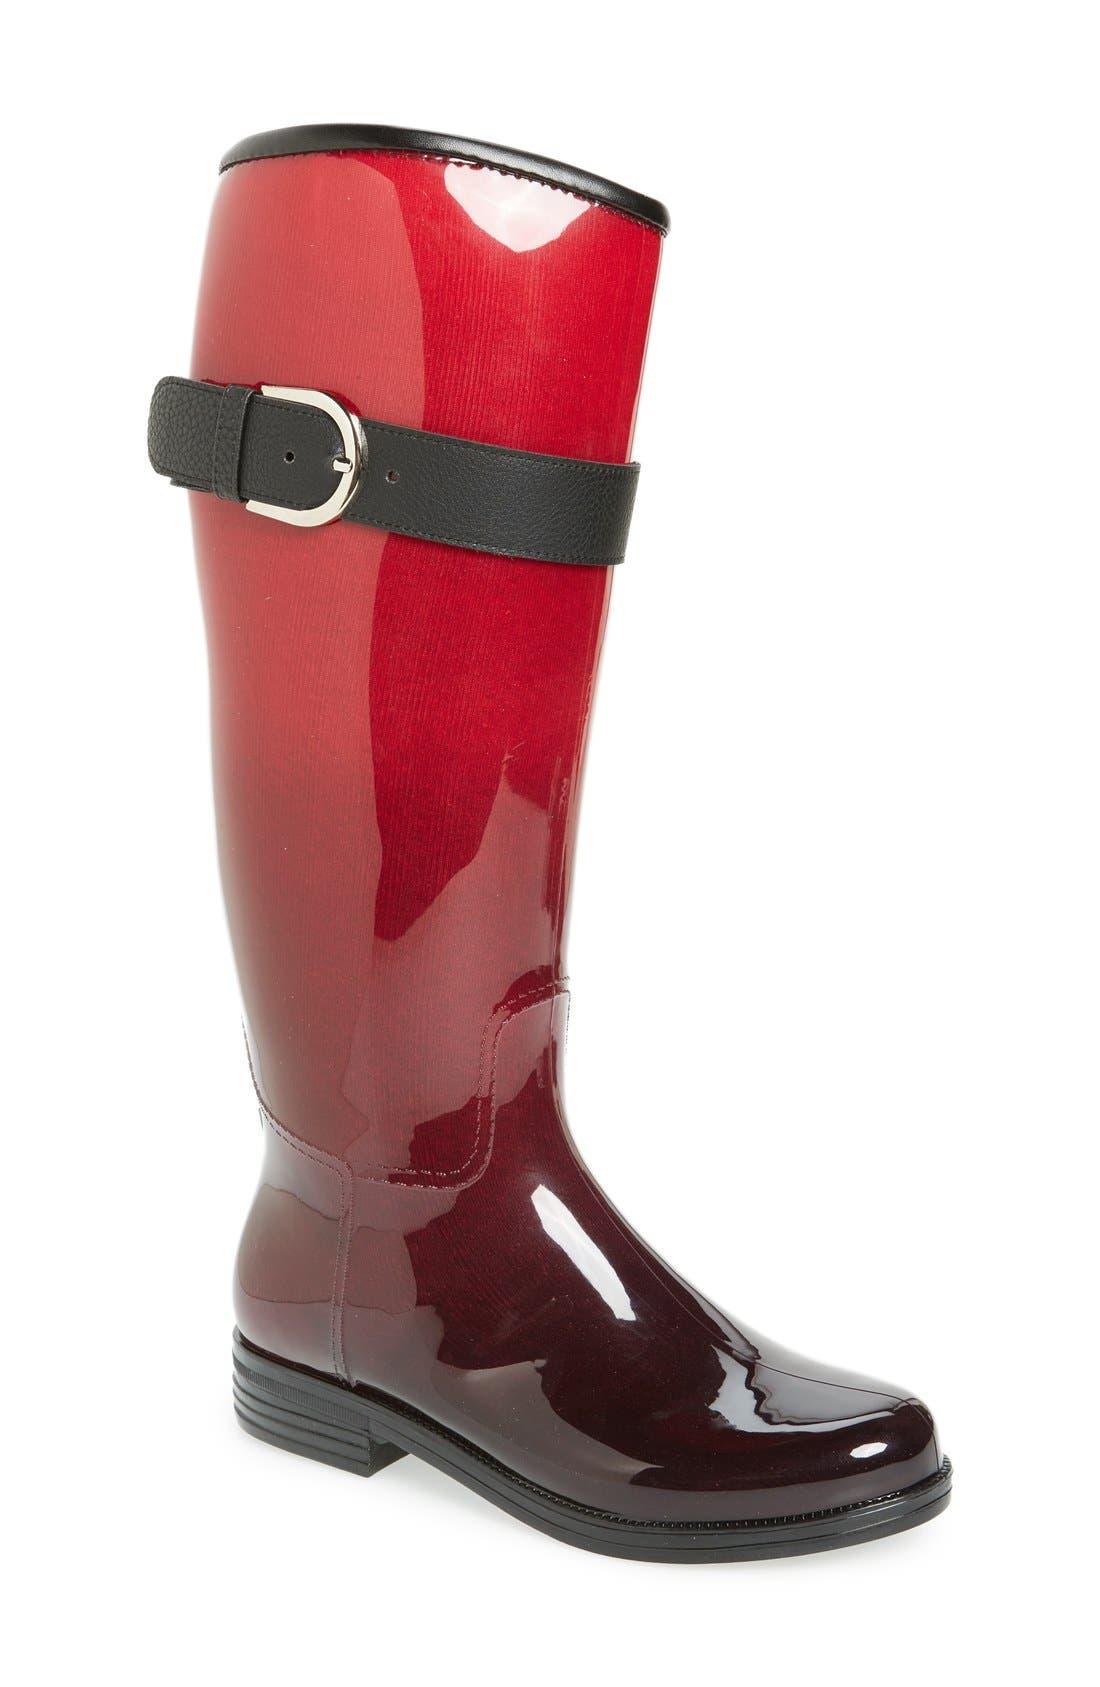 Alternate Image 1 Selected - däv 'Bristol' Weatherproof Knee High Rain Boot (Women)